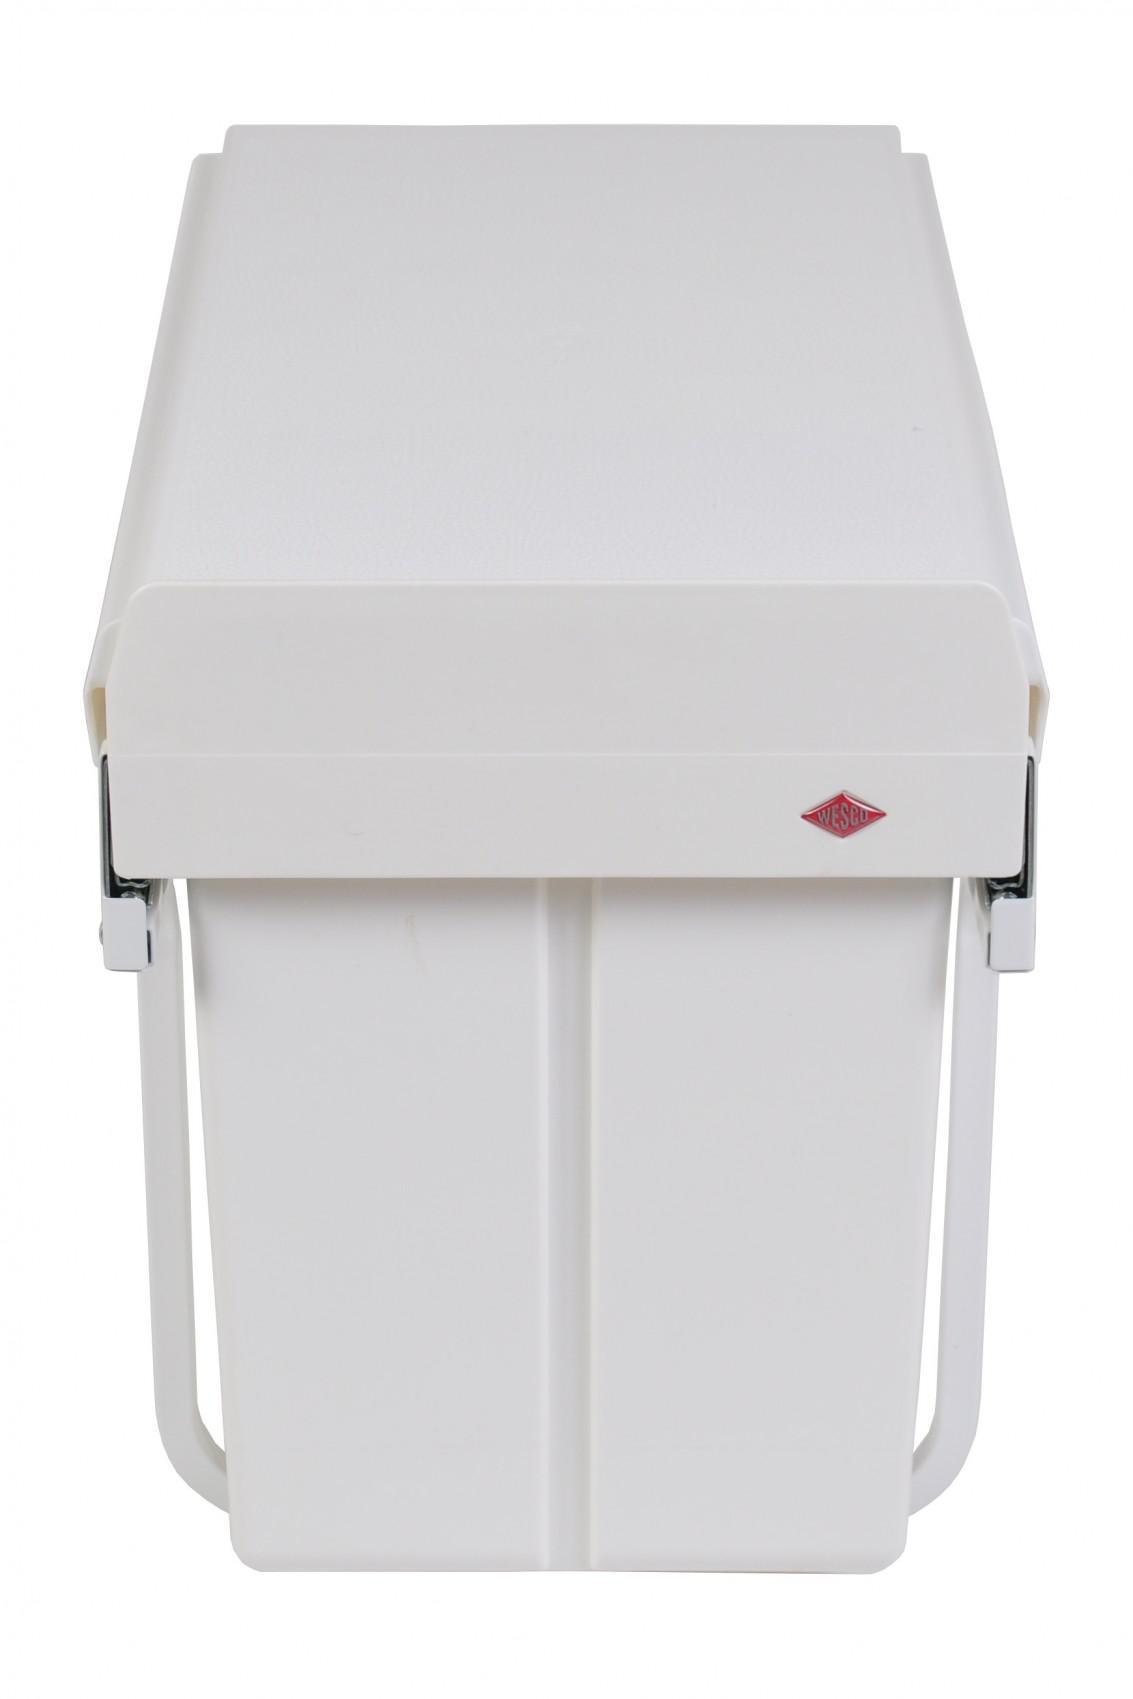 mlleimer grau fabulous finest hailo mlleimer with wesco mlleimer trennsystem with mlleimer. Black Bedroom Furniture Sets. Home Design Ideas